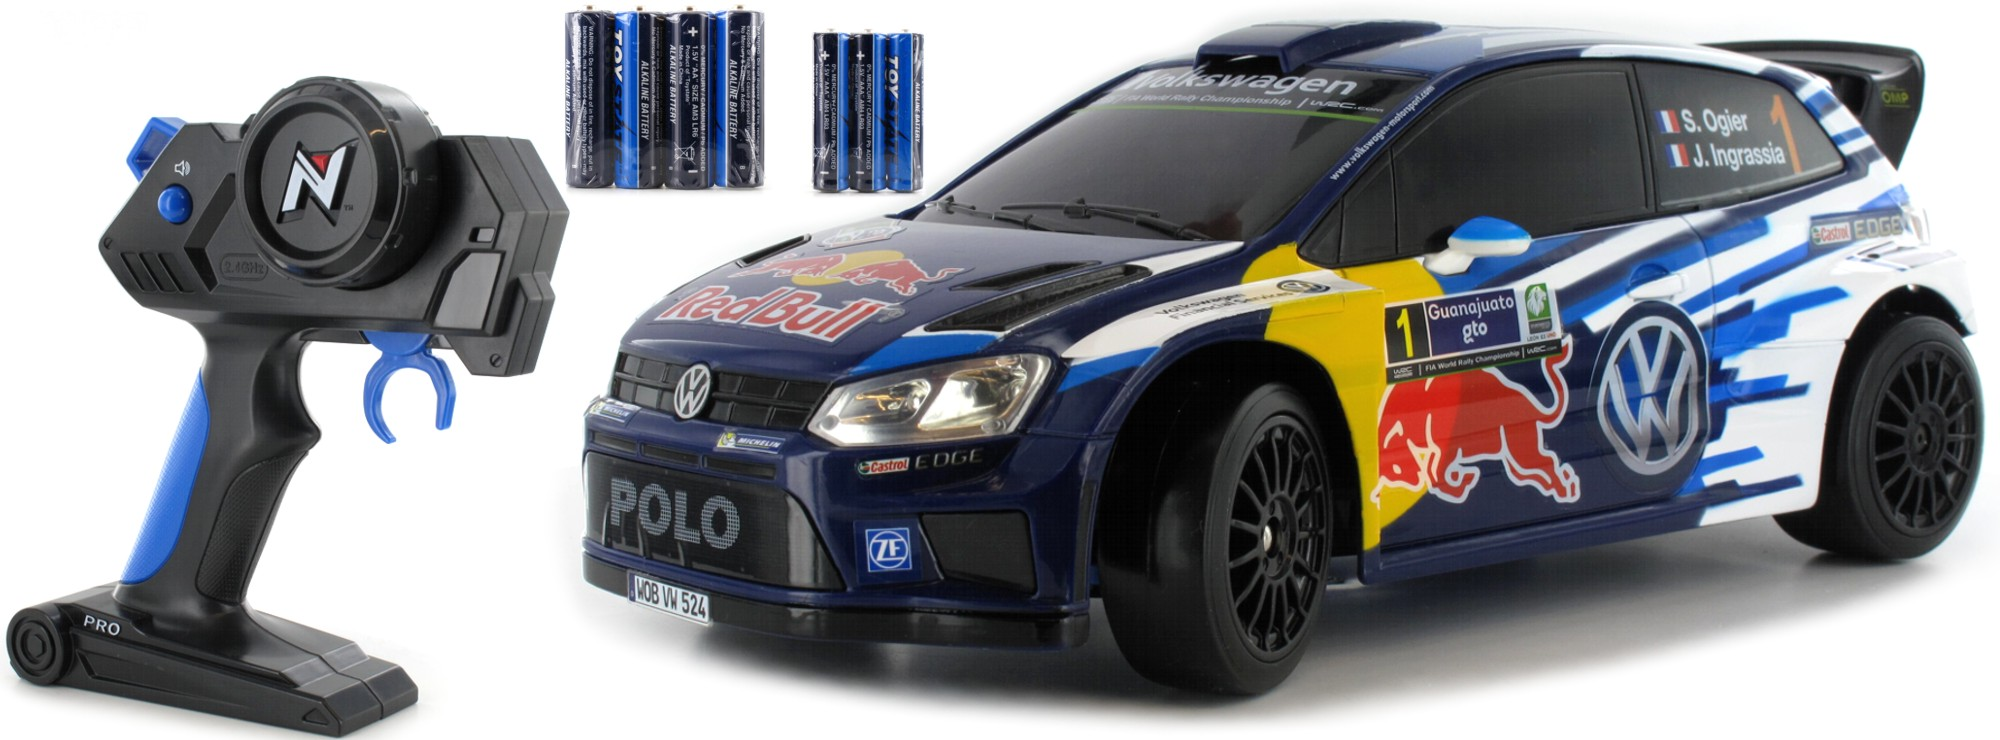 Nikko 36947 Vw Polo Wrc Rallye Red Bull Rc Auto Rtr 2 4 Ghz 1